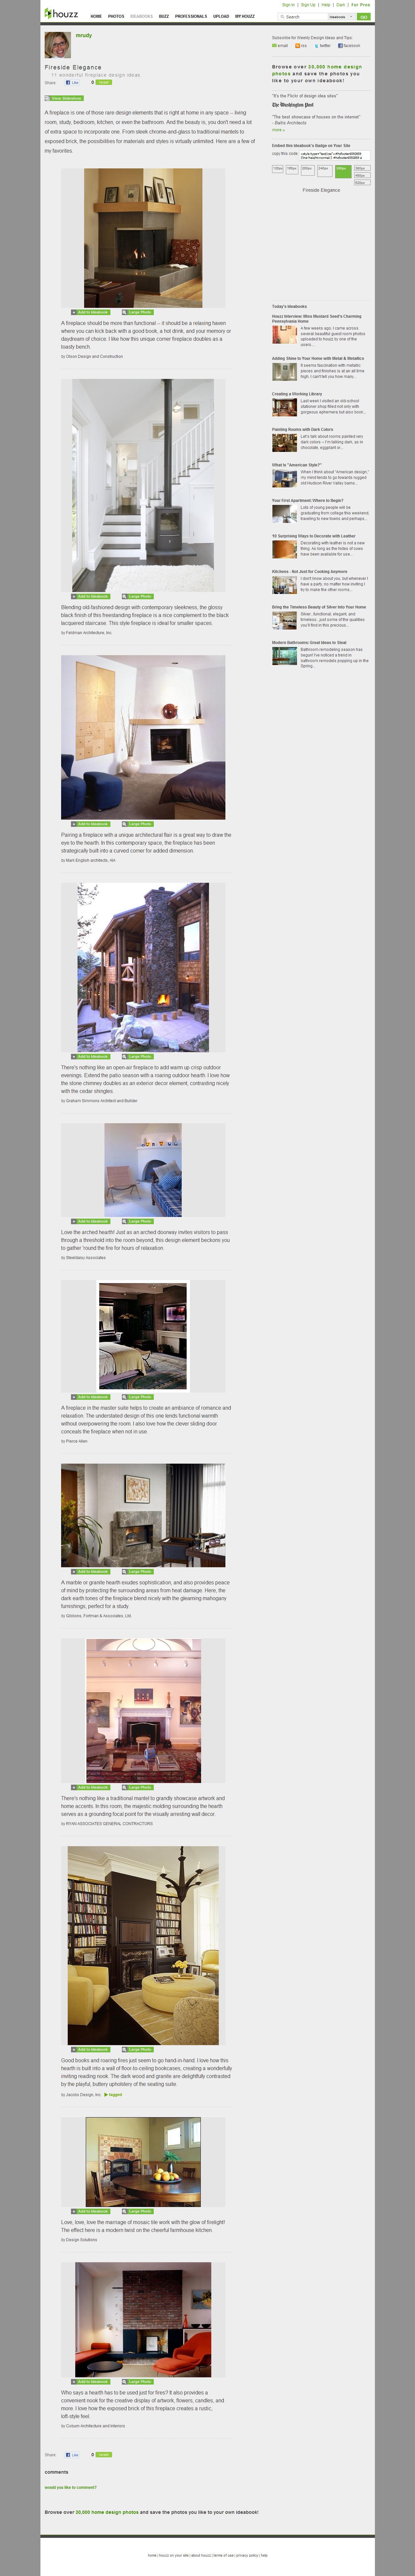 Home Decor Article: Fireplace Ideas